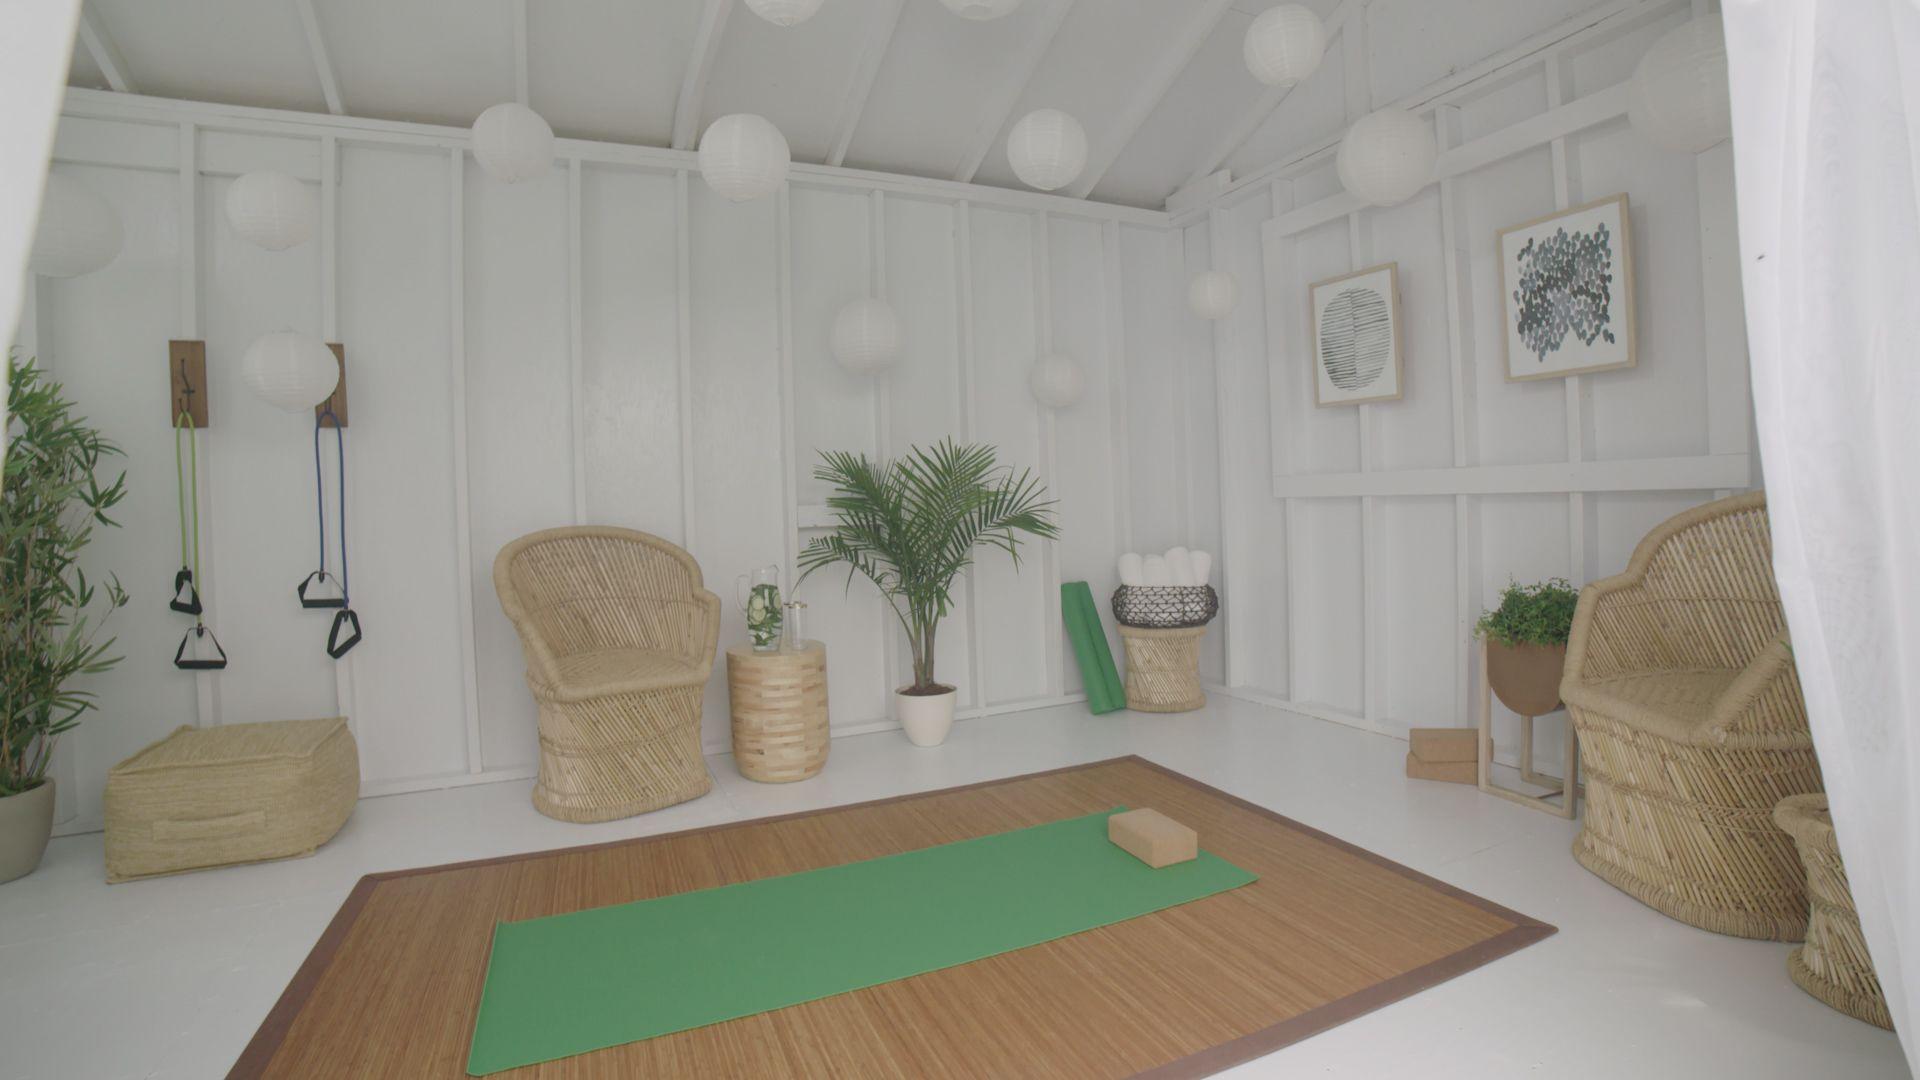 Turn An Old Shed Into A Yoga Retreat Home Yoga Room Yoga Studio Home Yoga Studio Design Diy backyard yoga studio